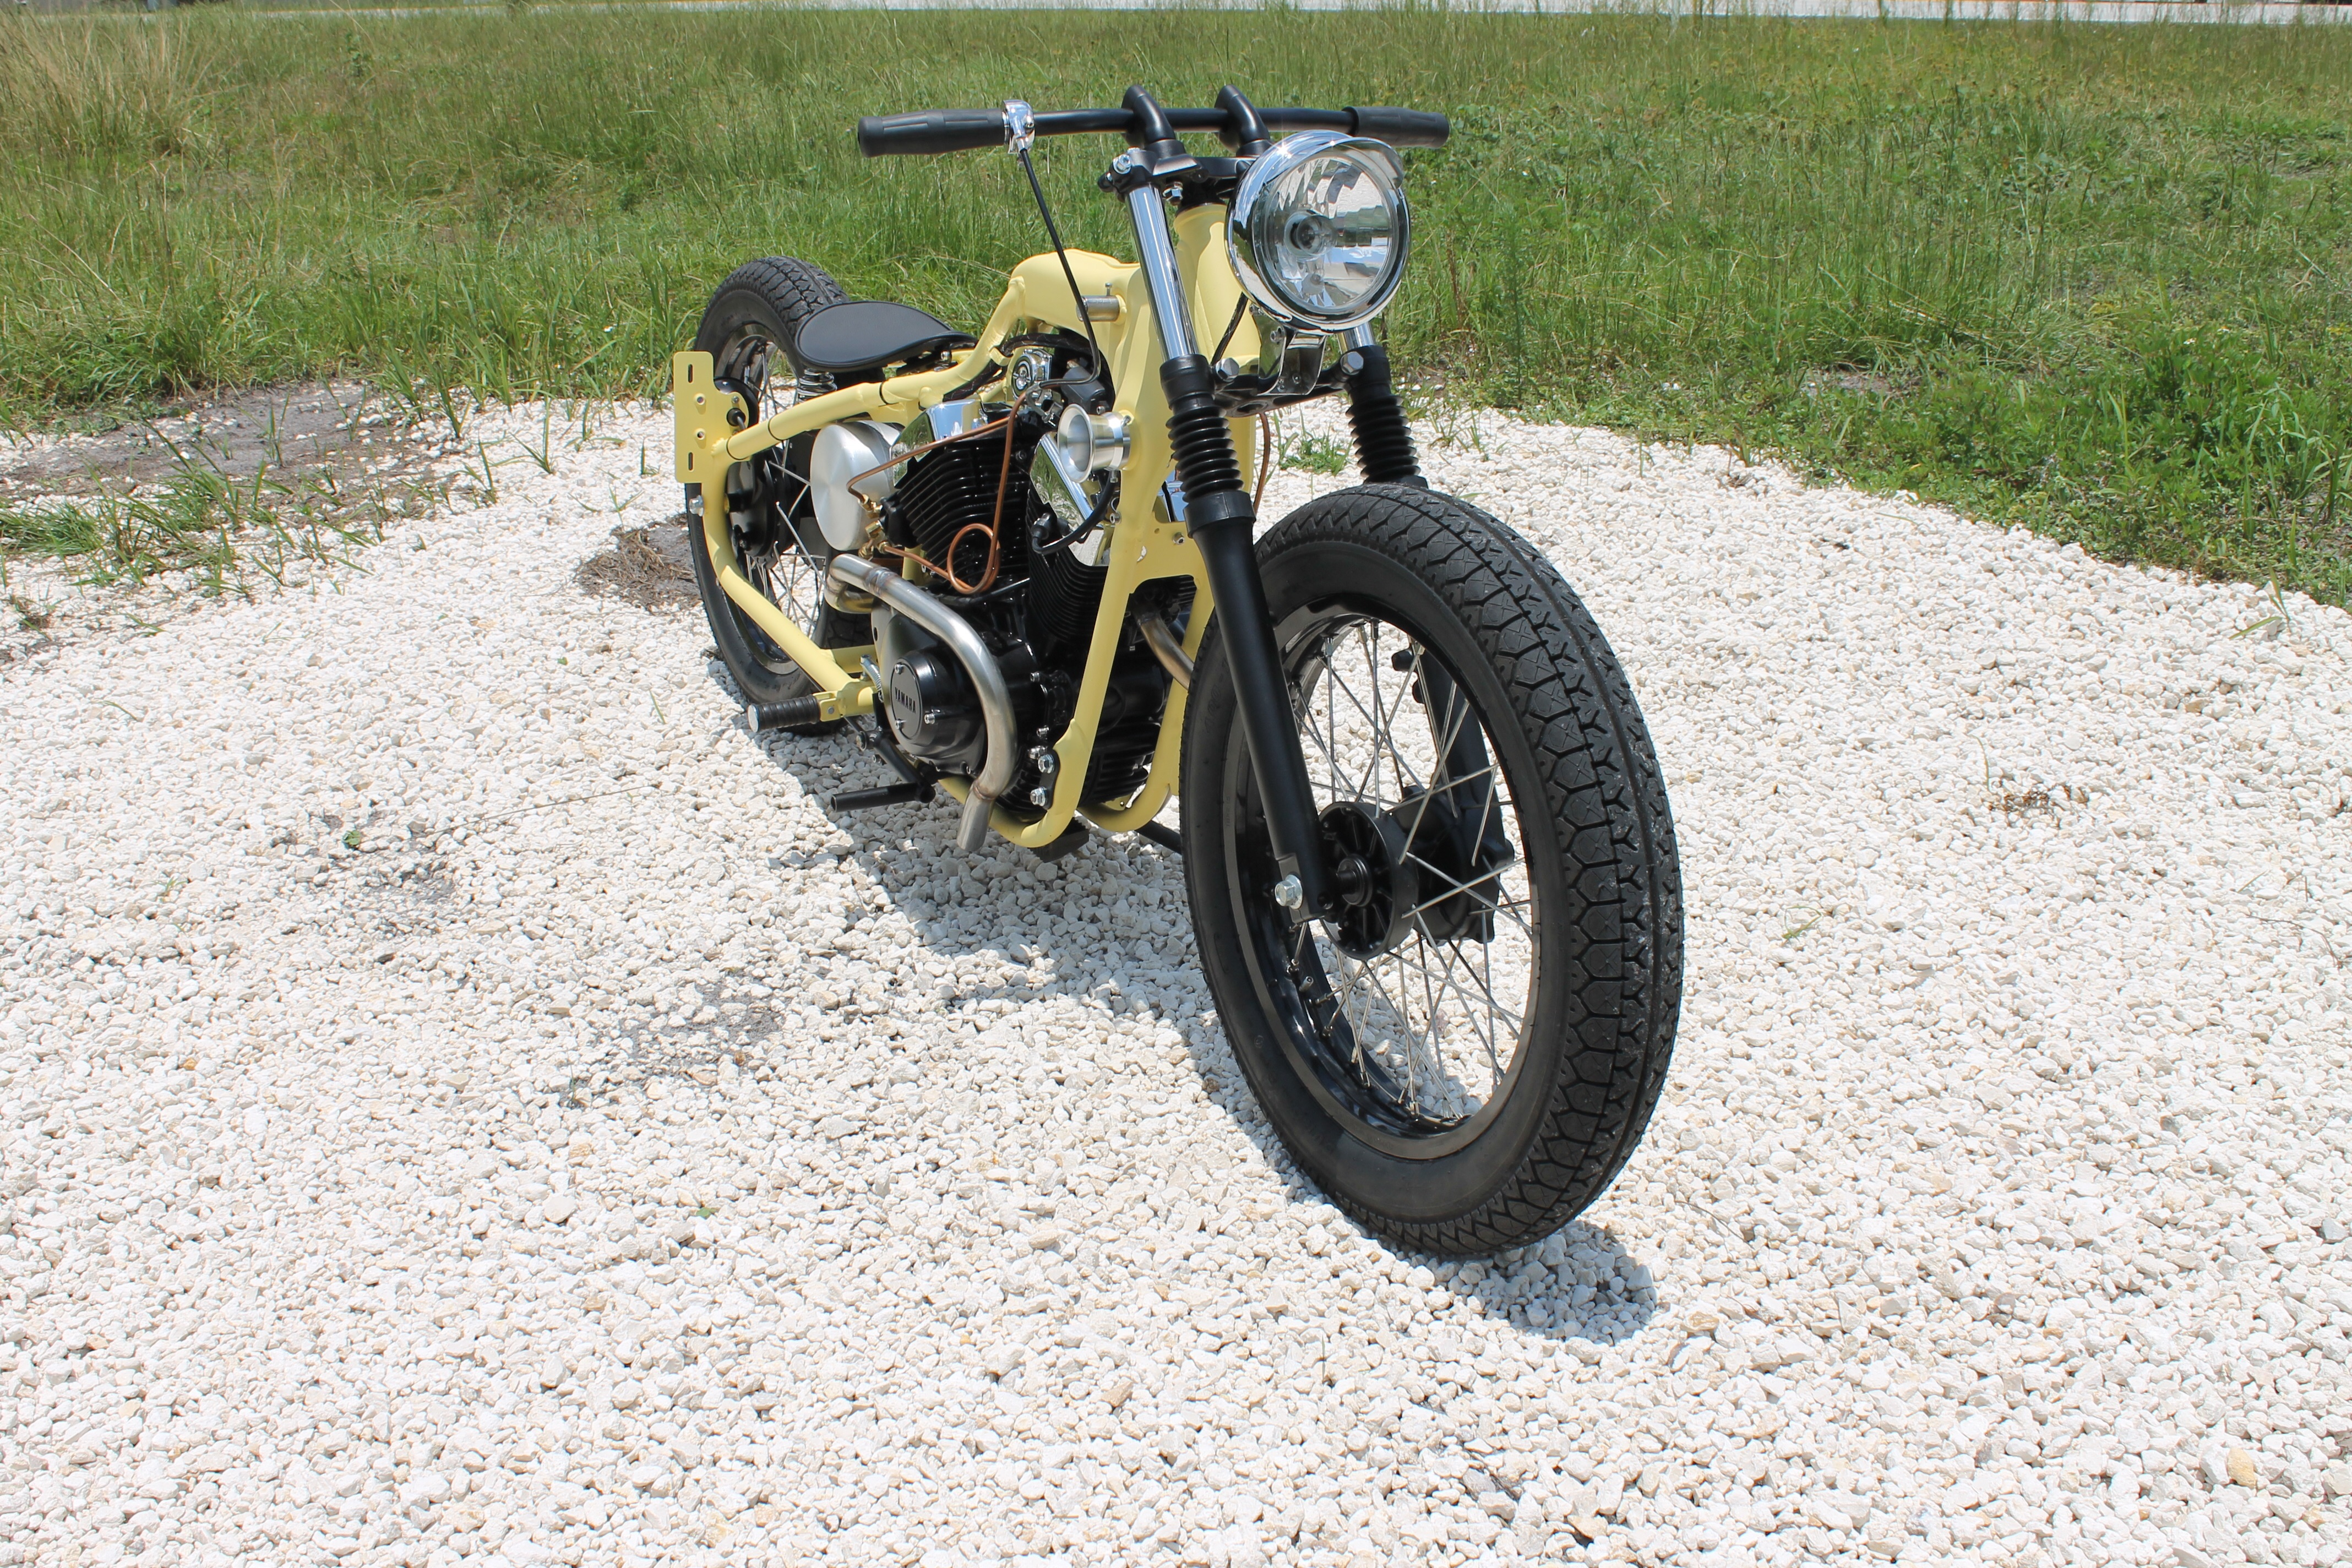 Yamaha xv250 beach bobber bikebound for Yamaha virago 250